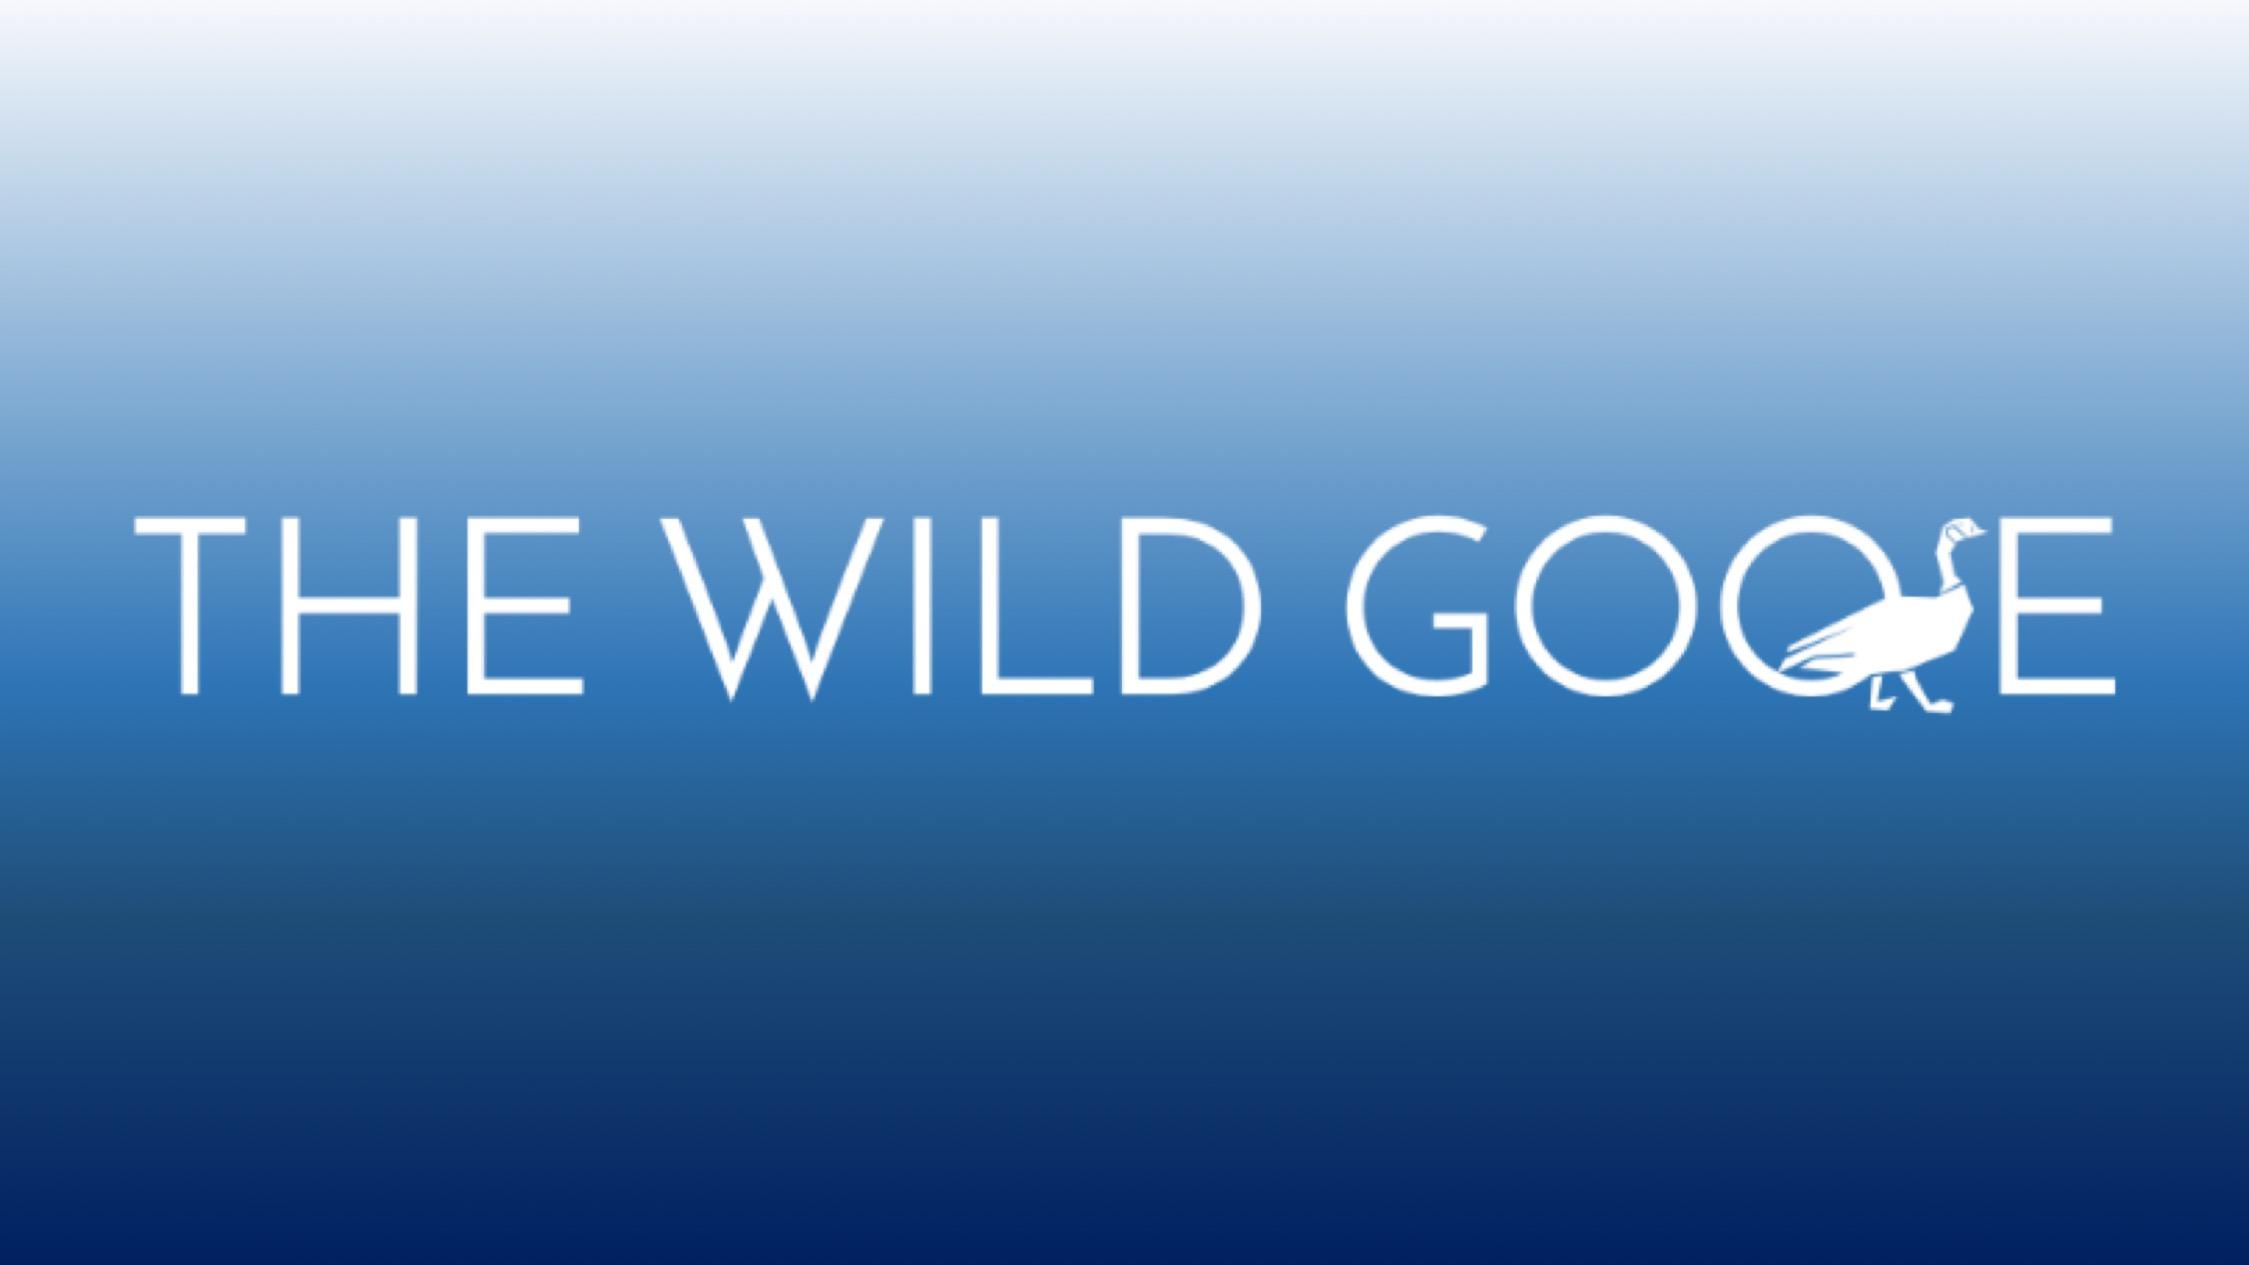 Wild goose.jpg